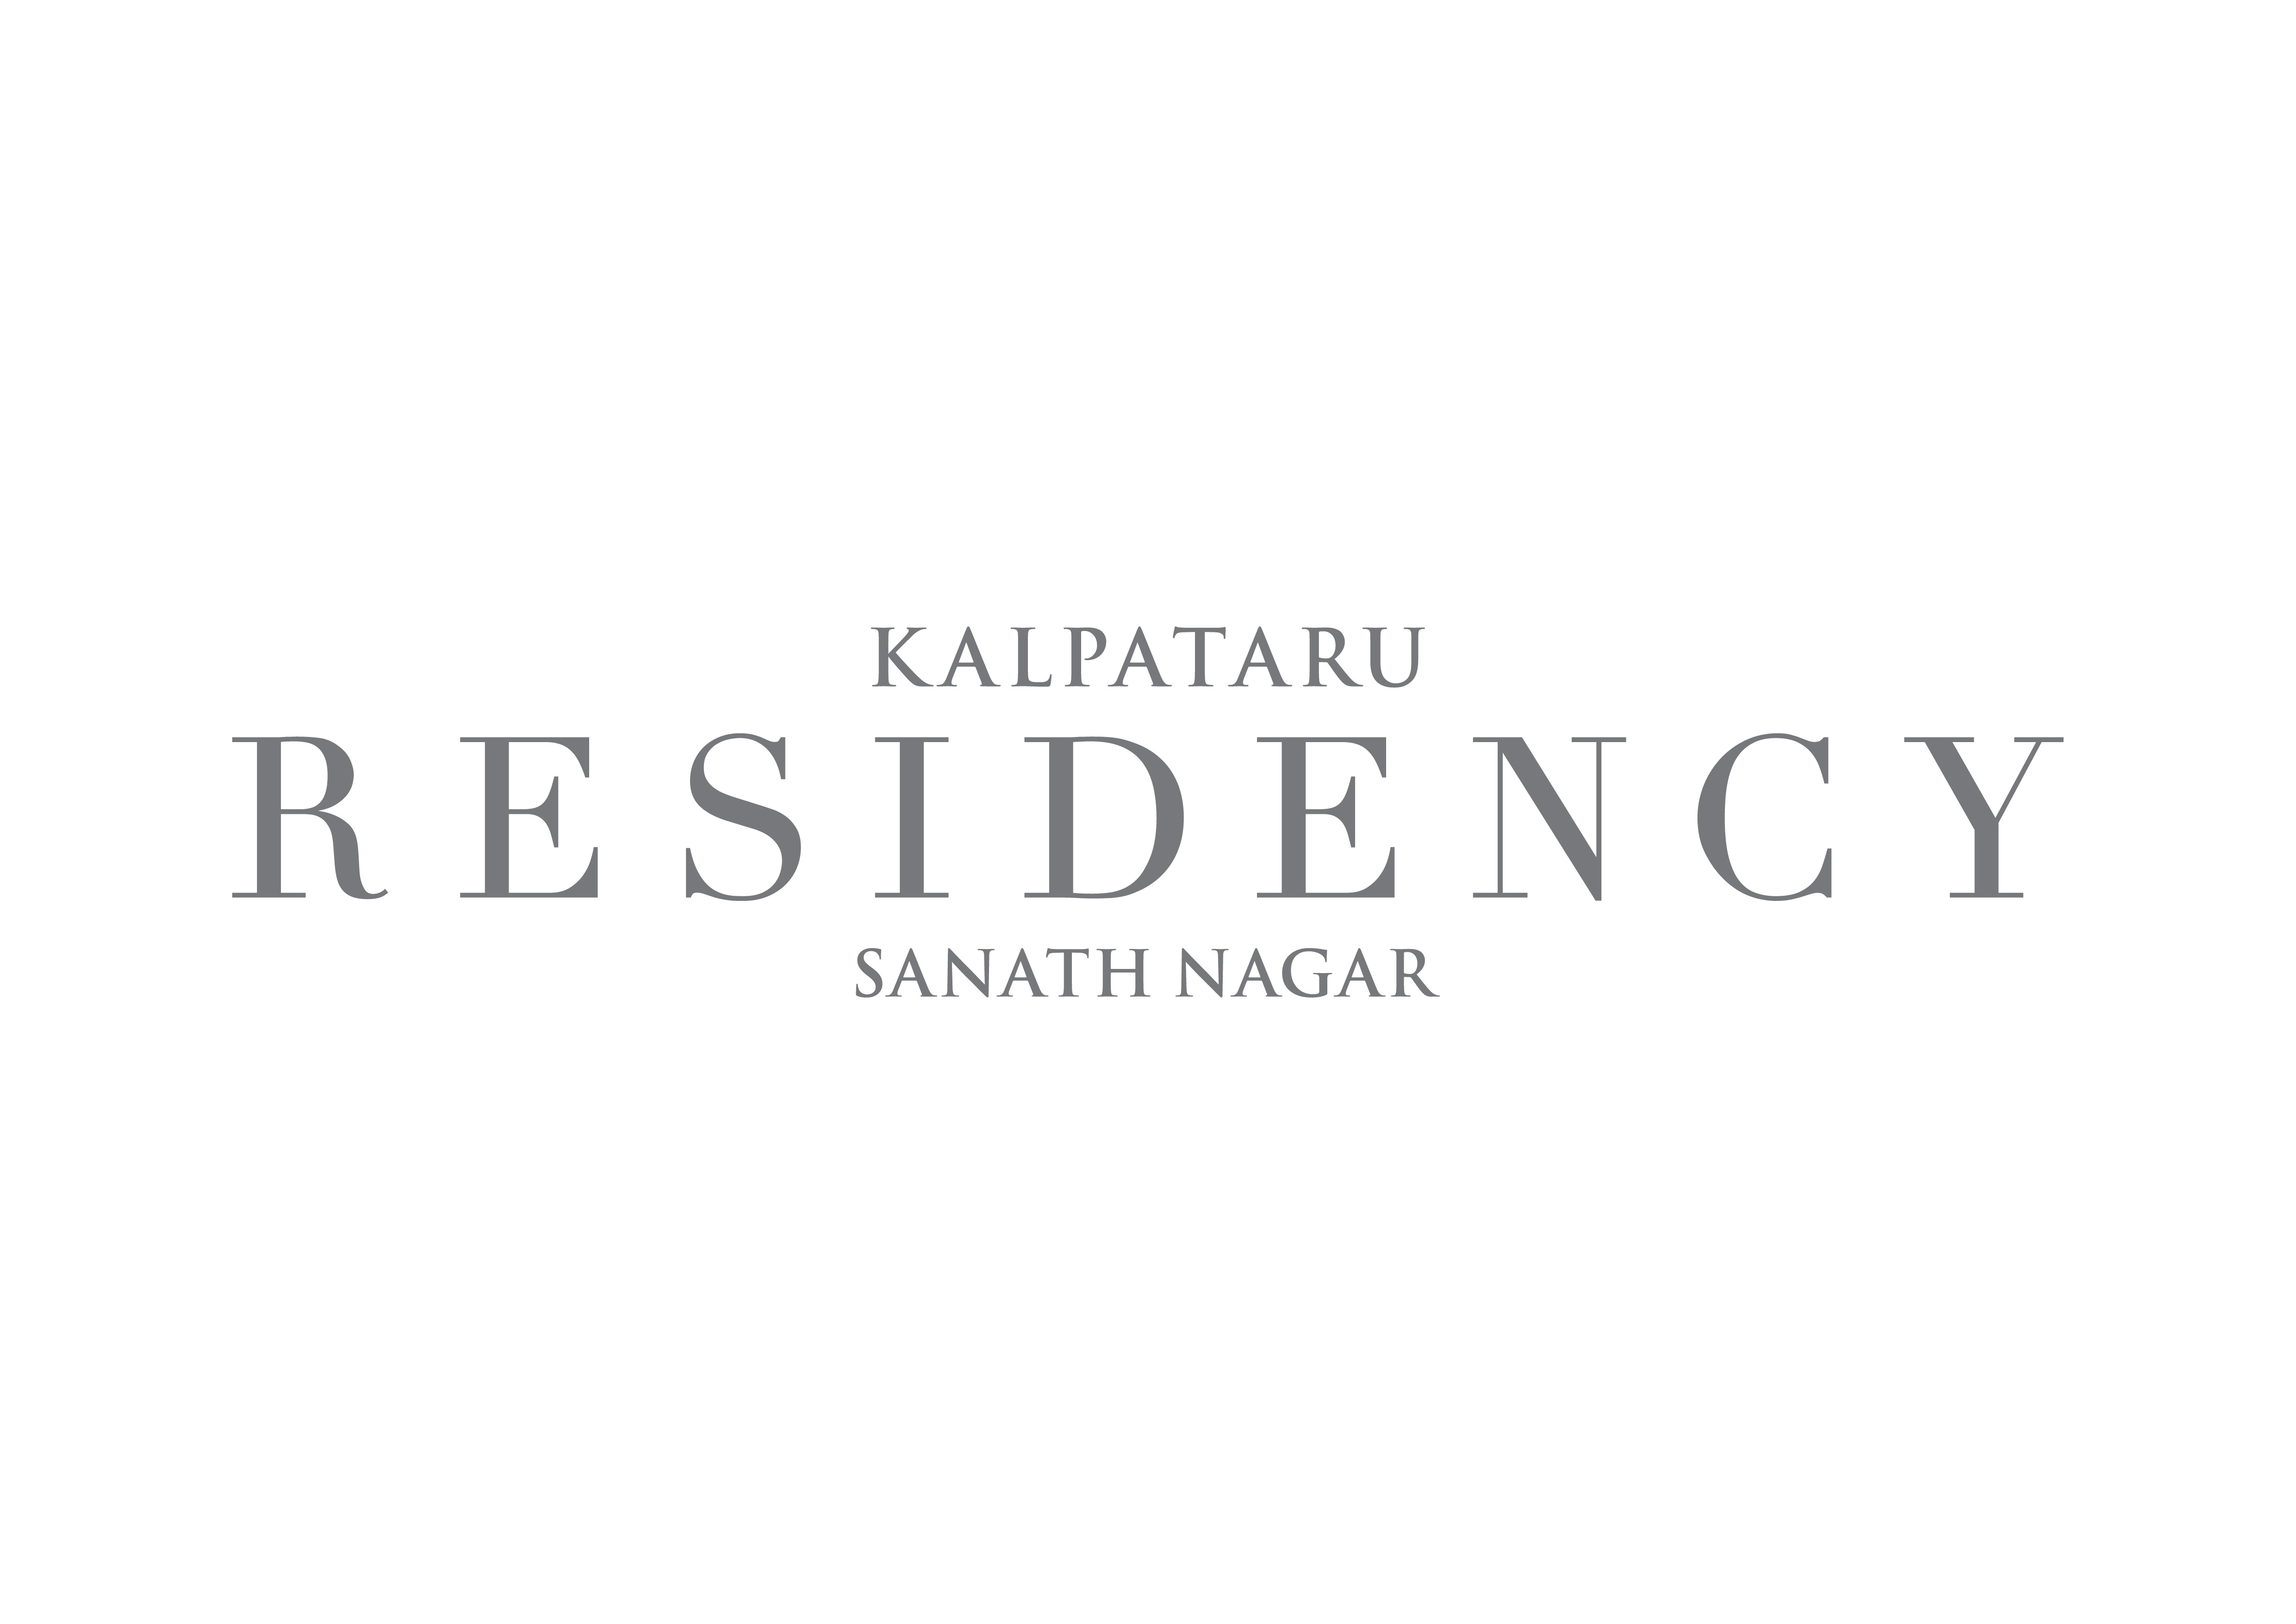 LOGO - Kalpataru Residency